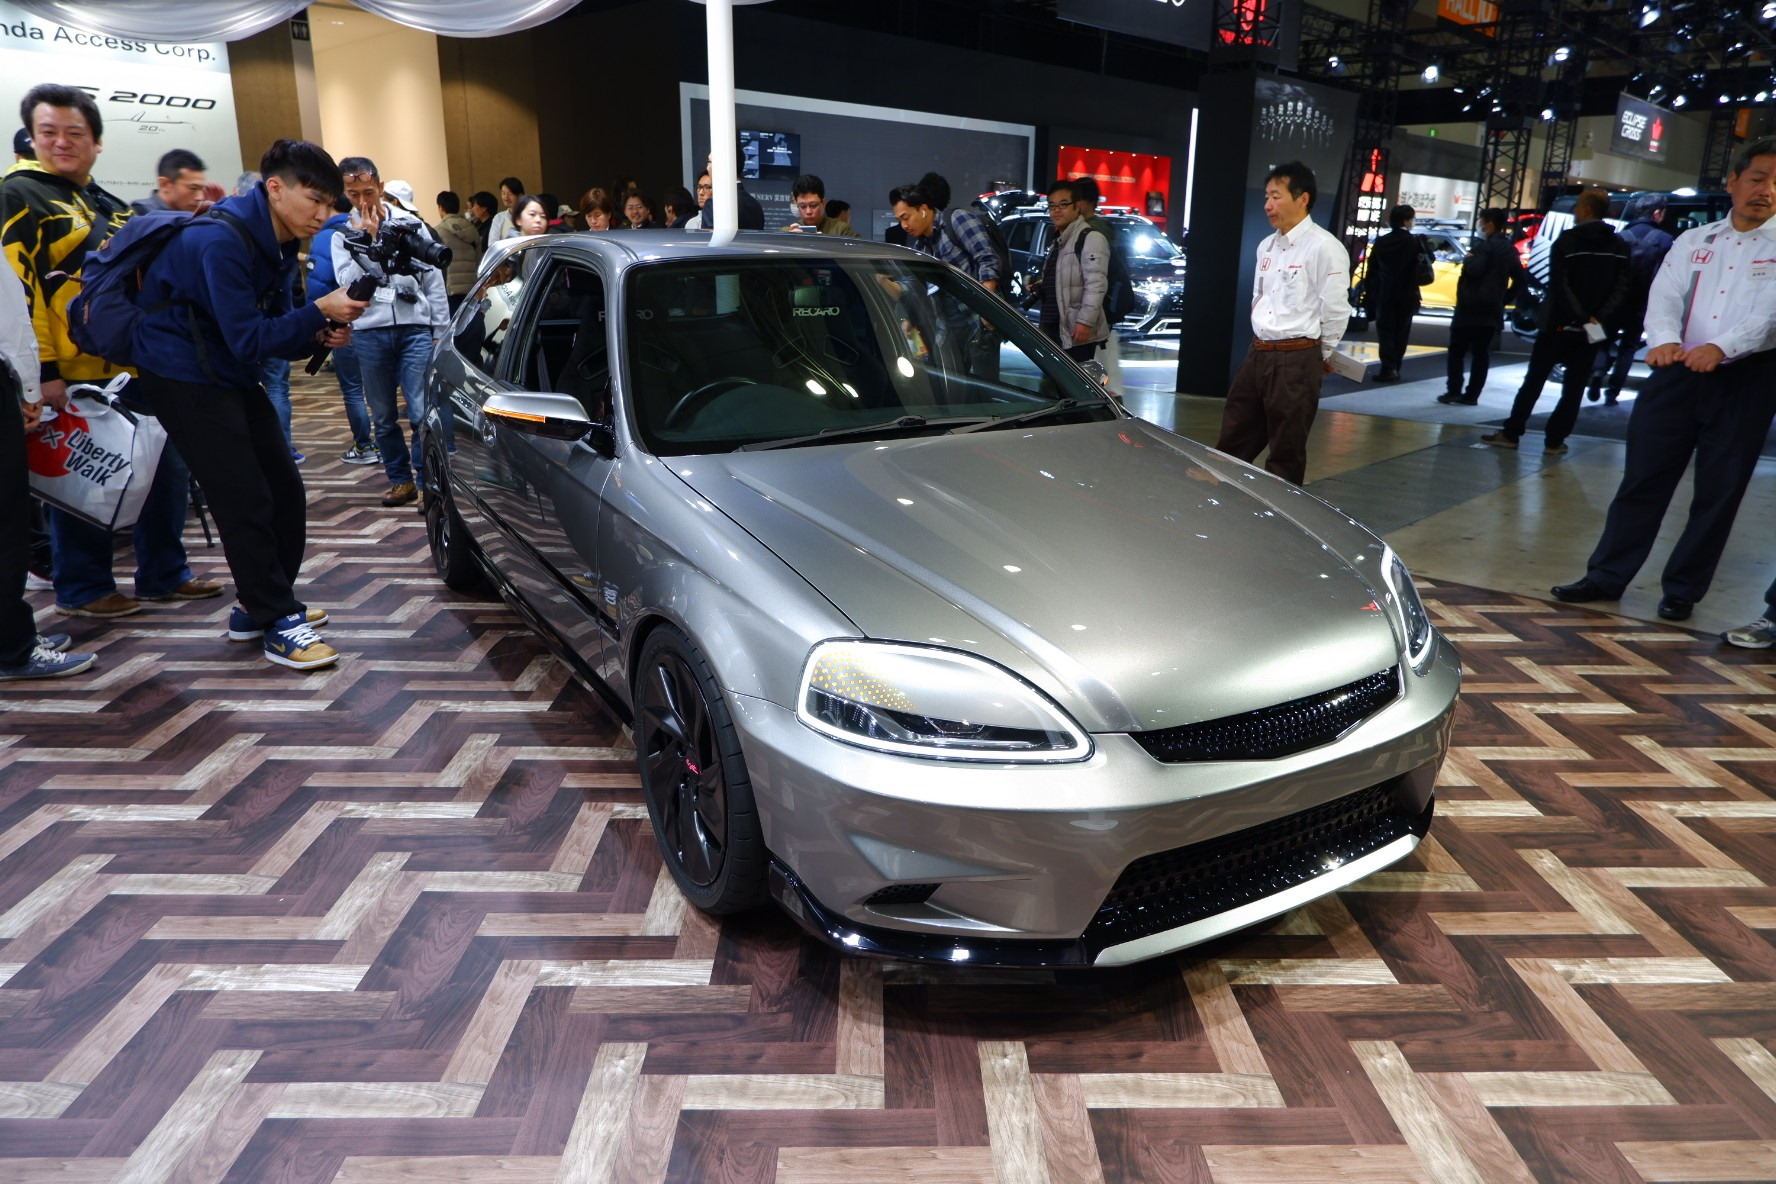 Honda S Civic Cyber Night Japan Cruiser 2020 Is A 1997 Civic Type R Ek9 Restomod Carscoops